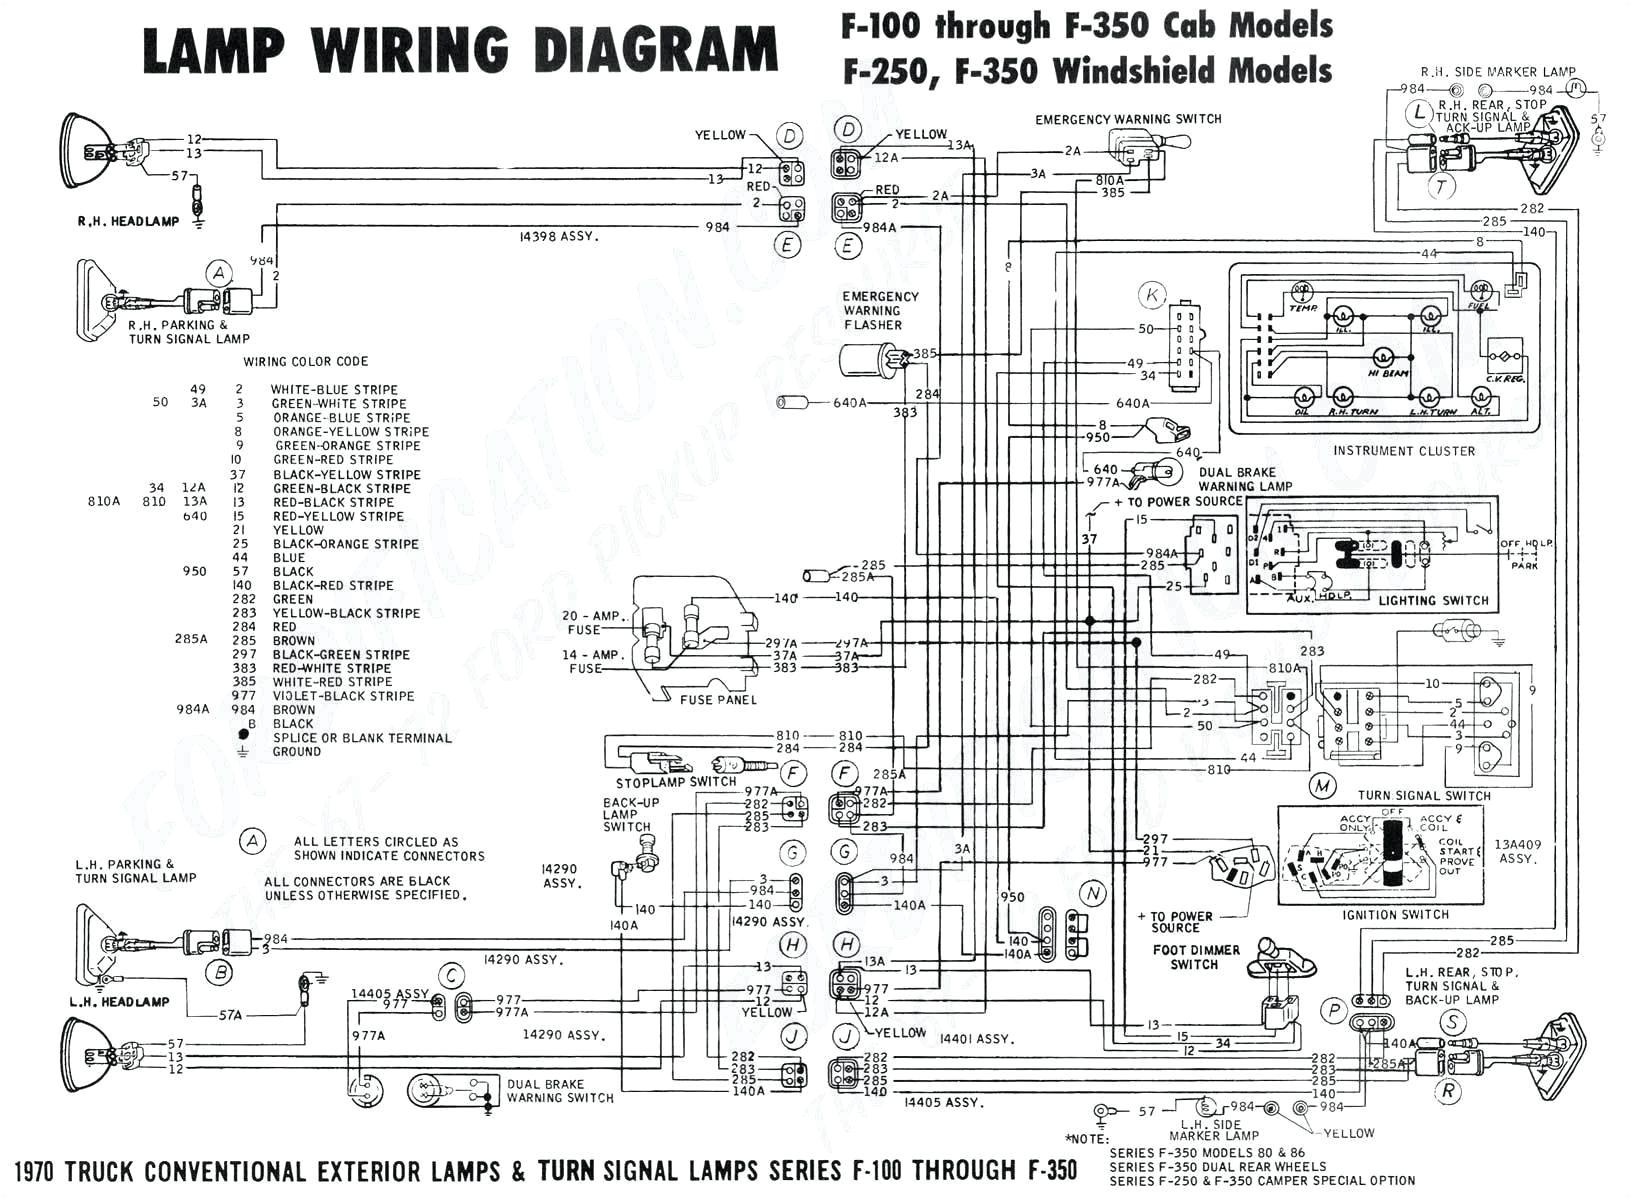 38v wiring diagram data wiring diagram preview wiring diagram symbols free download tutorial 2015 electrical wiring